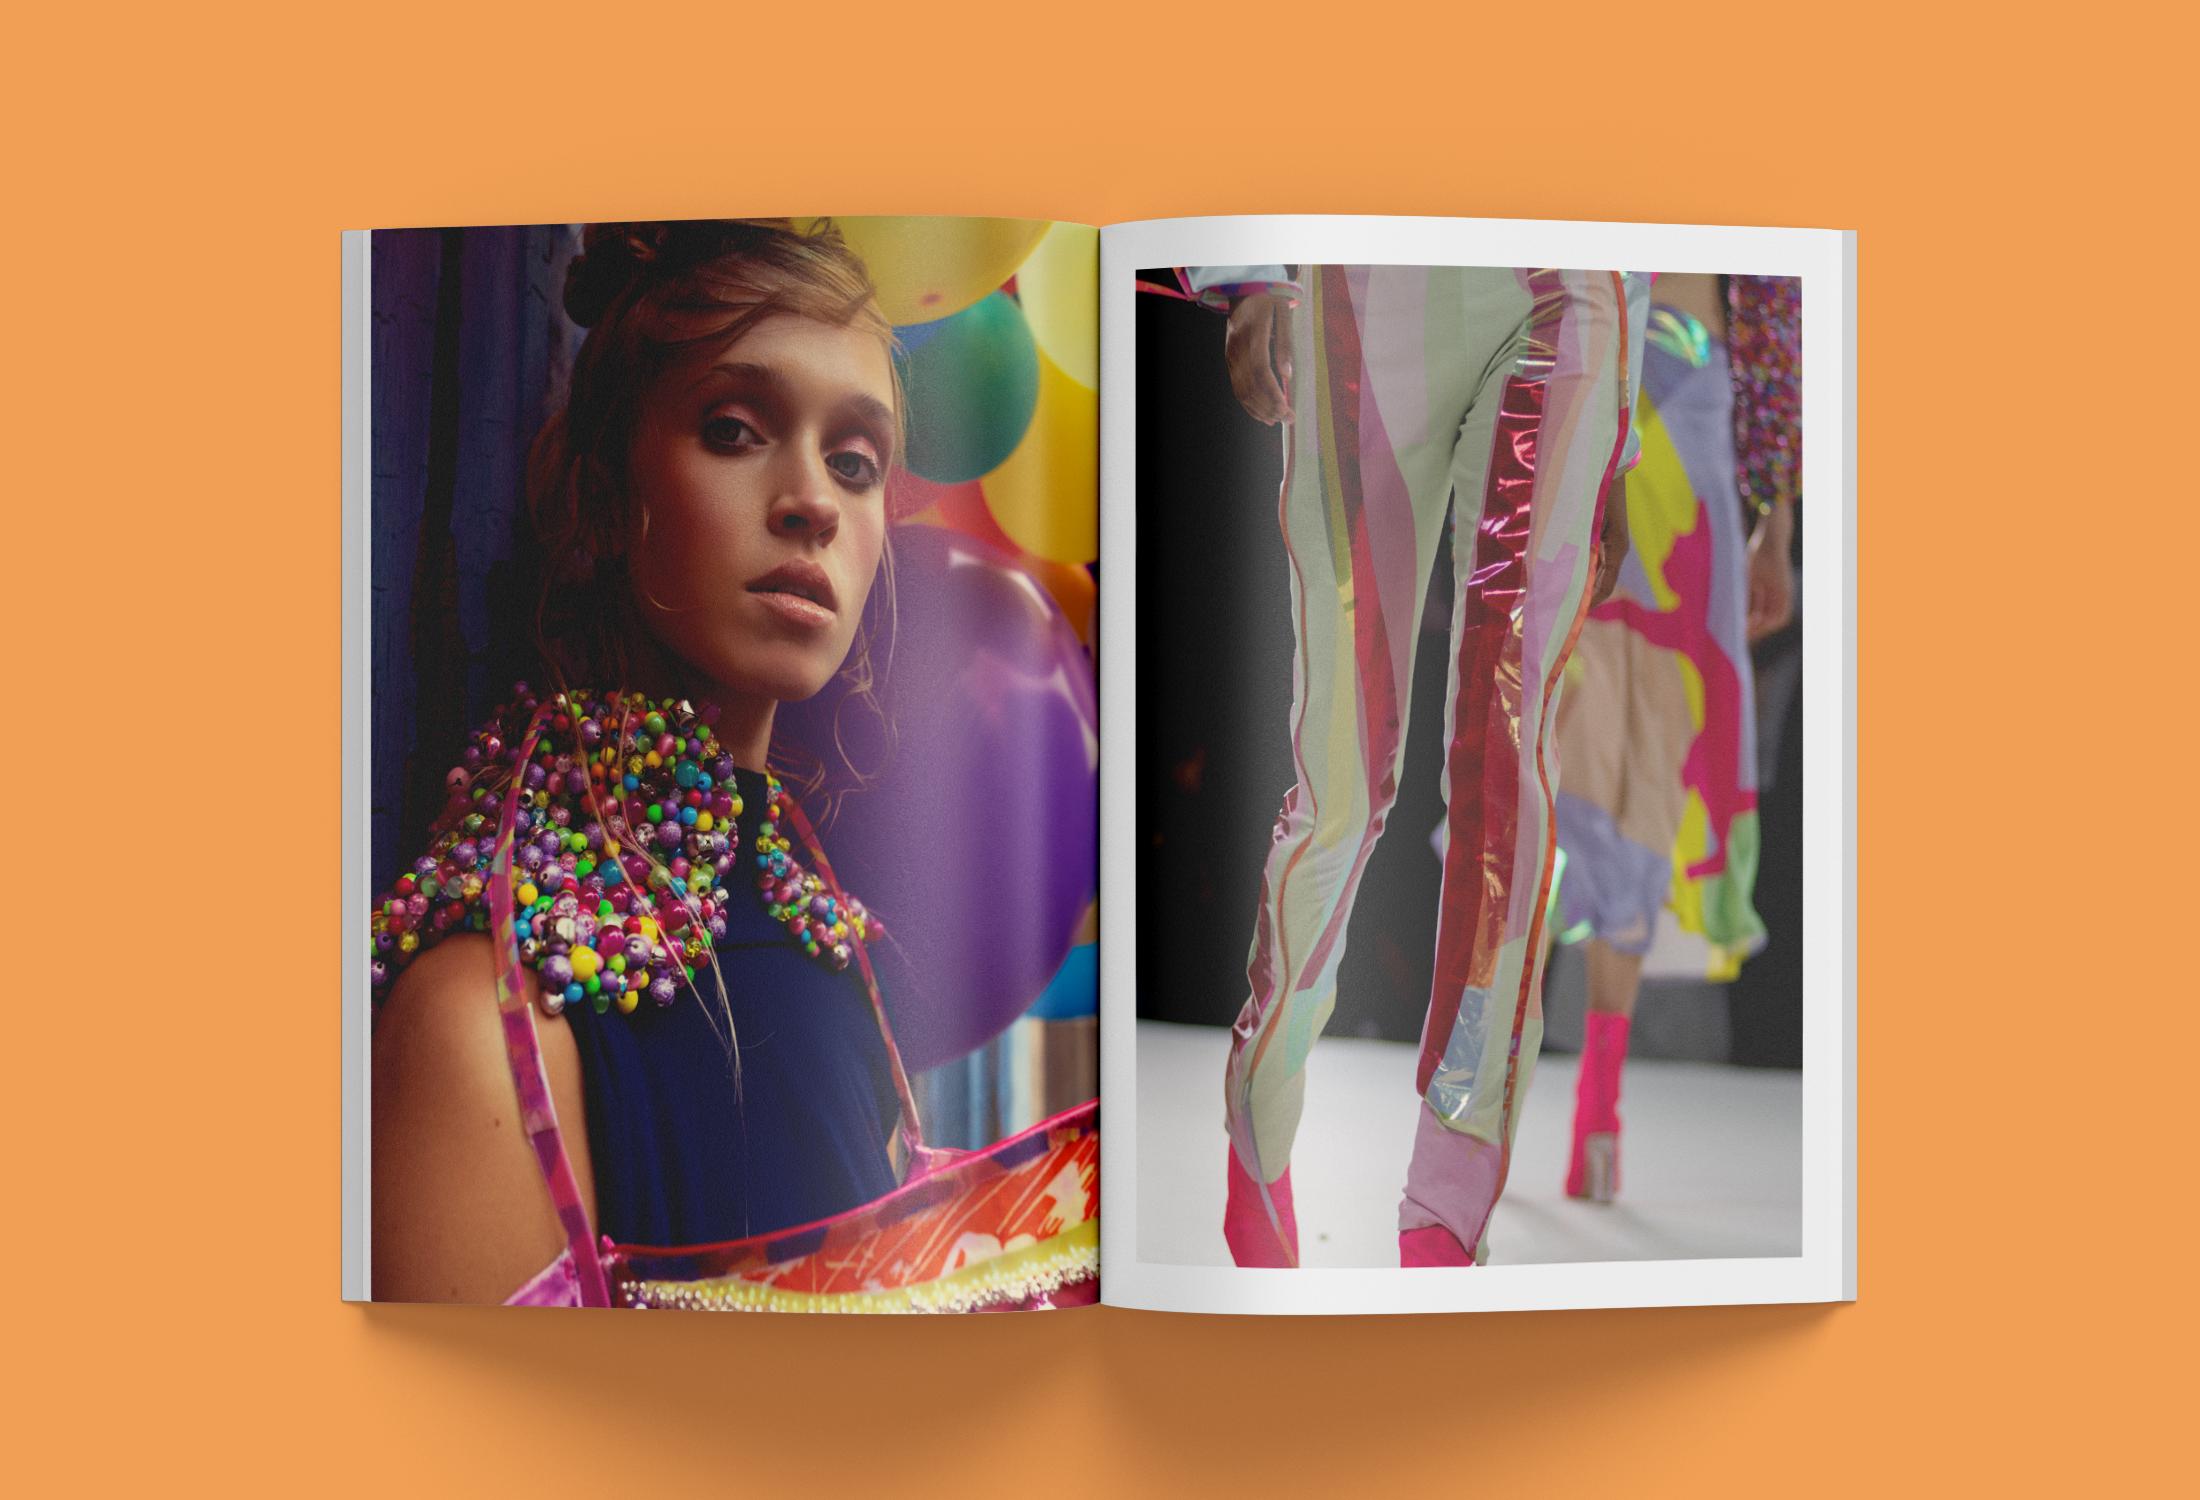 Model Citizen Magazine Issue 31, Macky Suson, Fashion Inclusion Now4.png